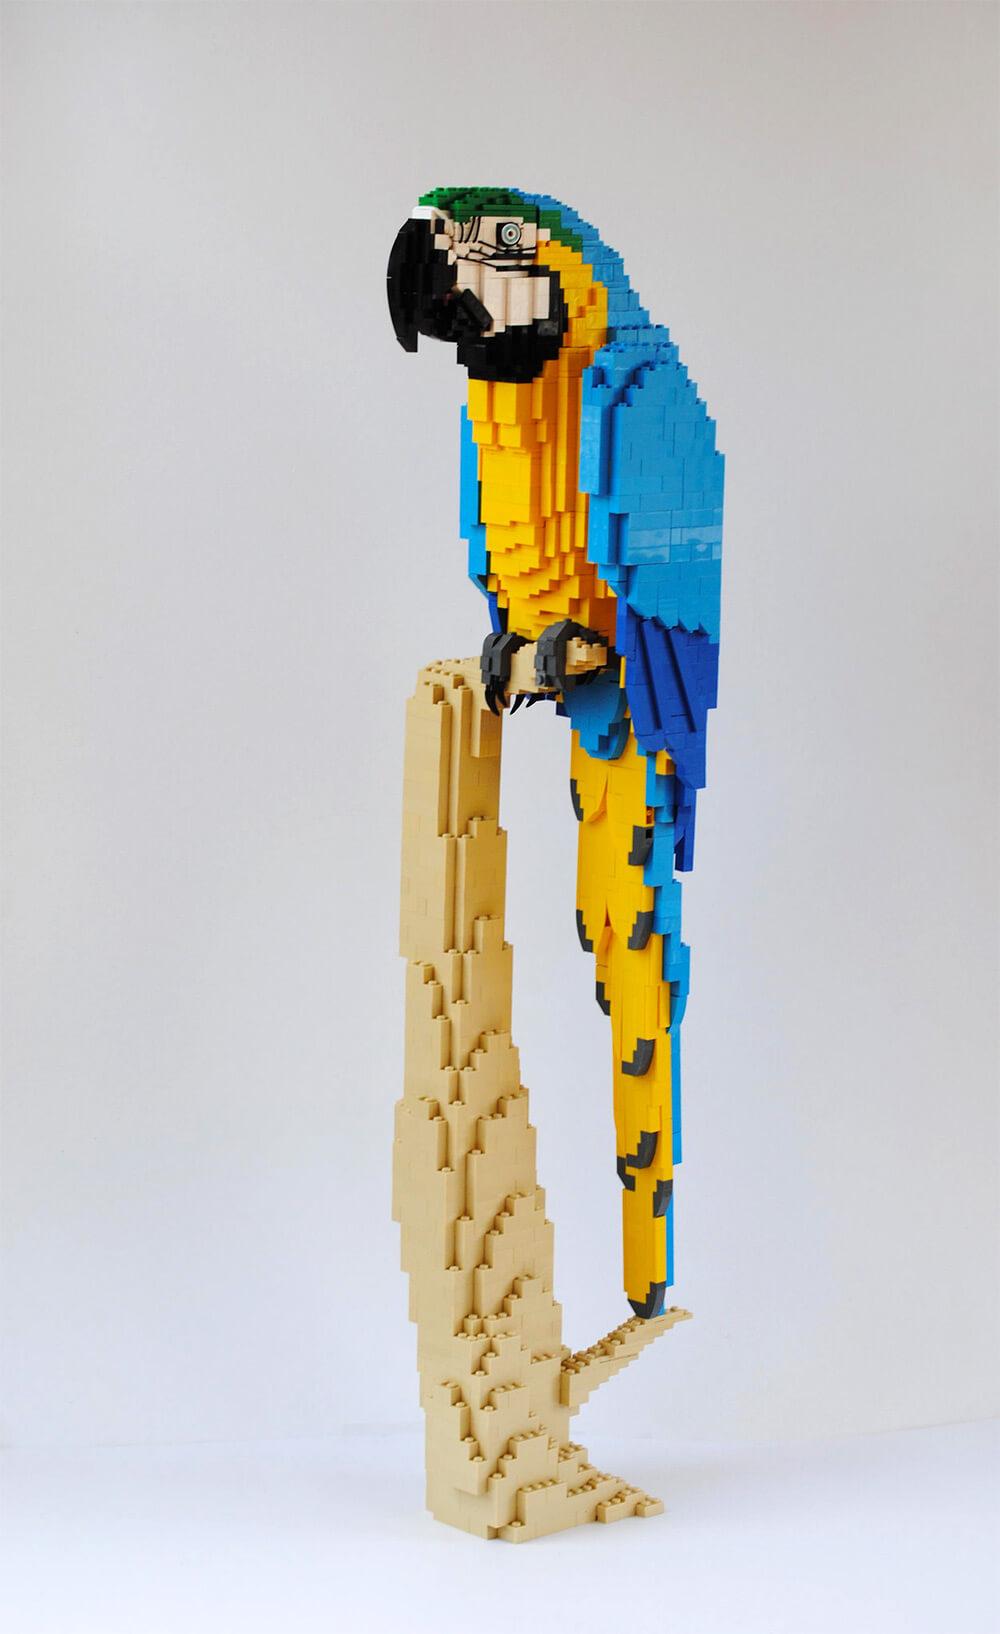 LEGO sculptures 8 (1)